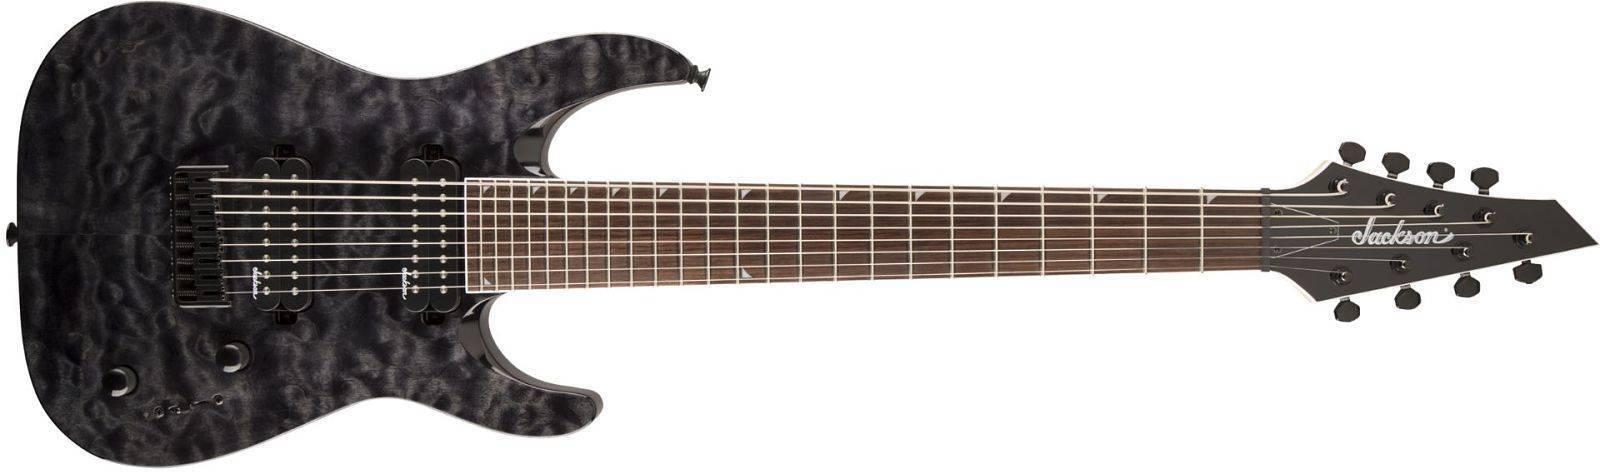 Guitarra Jackson 8 cuerdas JS32 DINKY™ ARCH TOP